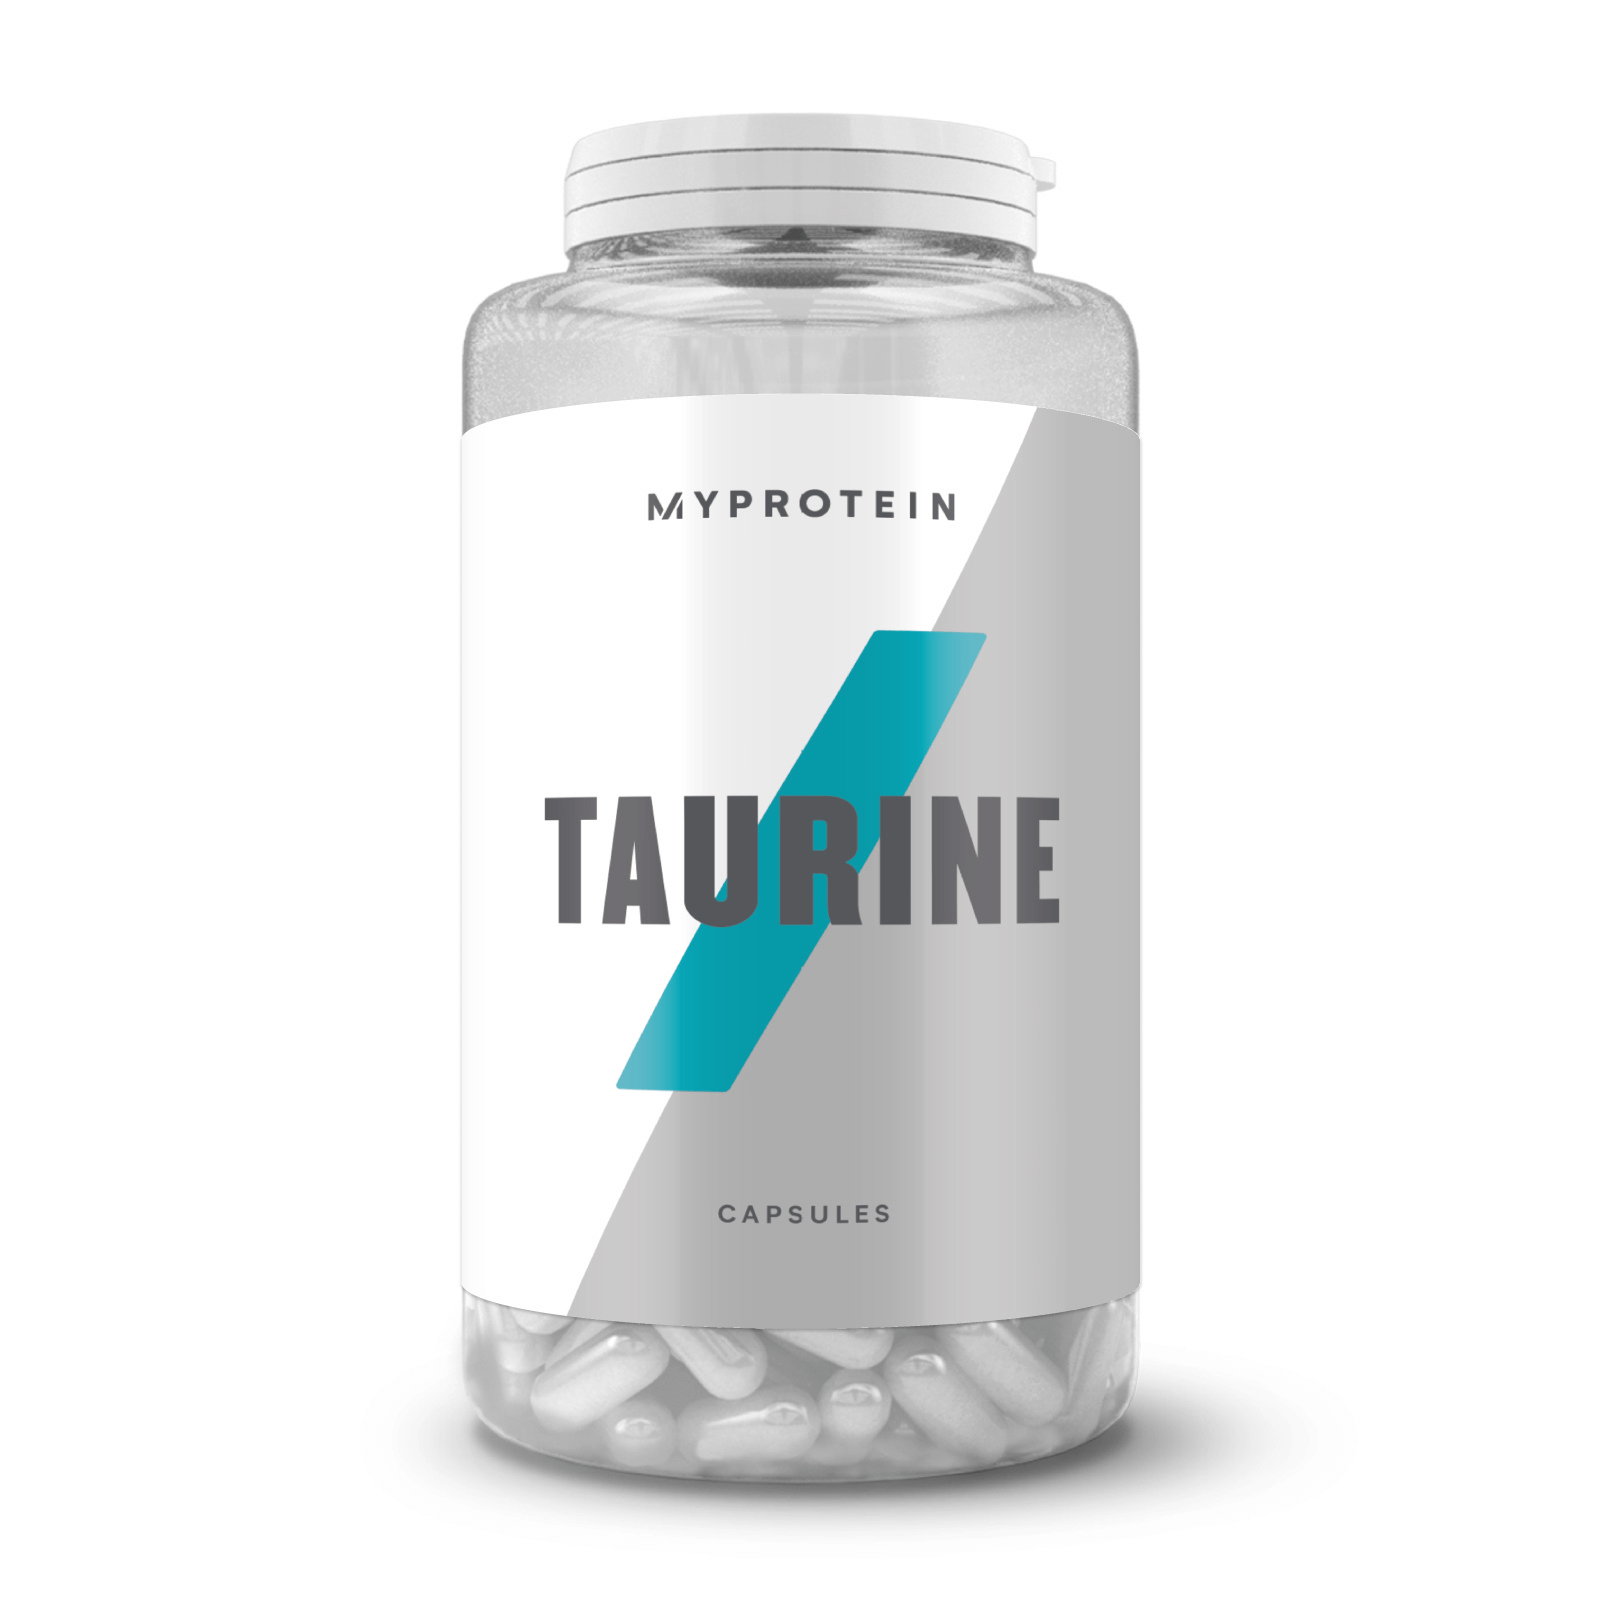 Capsules de Taurine - 90Gélules - Taurine